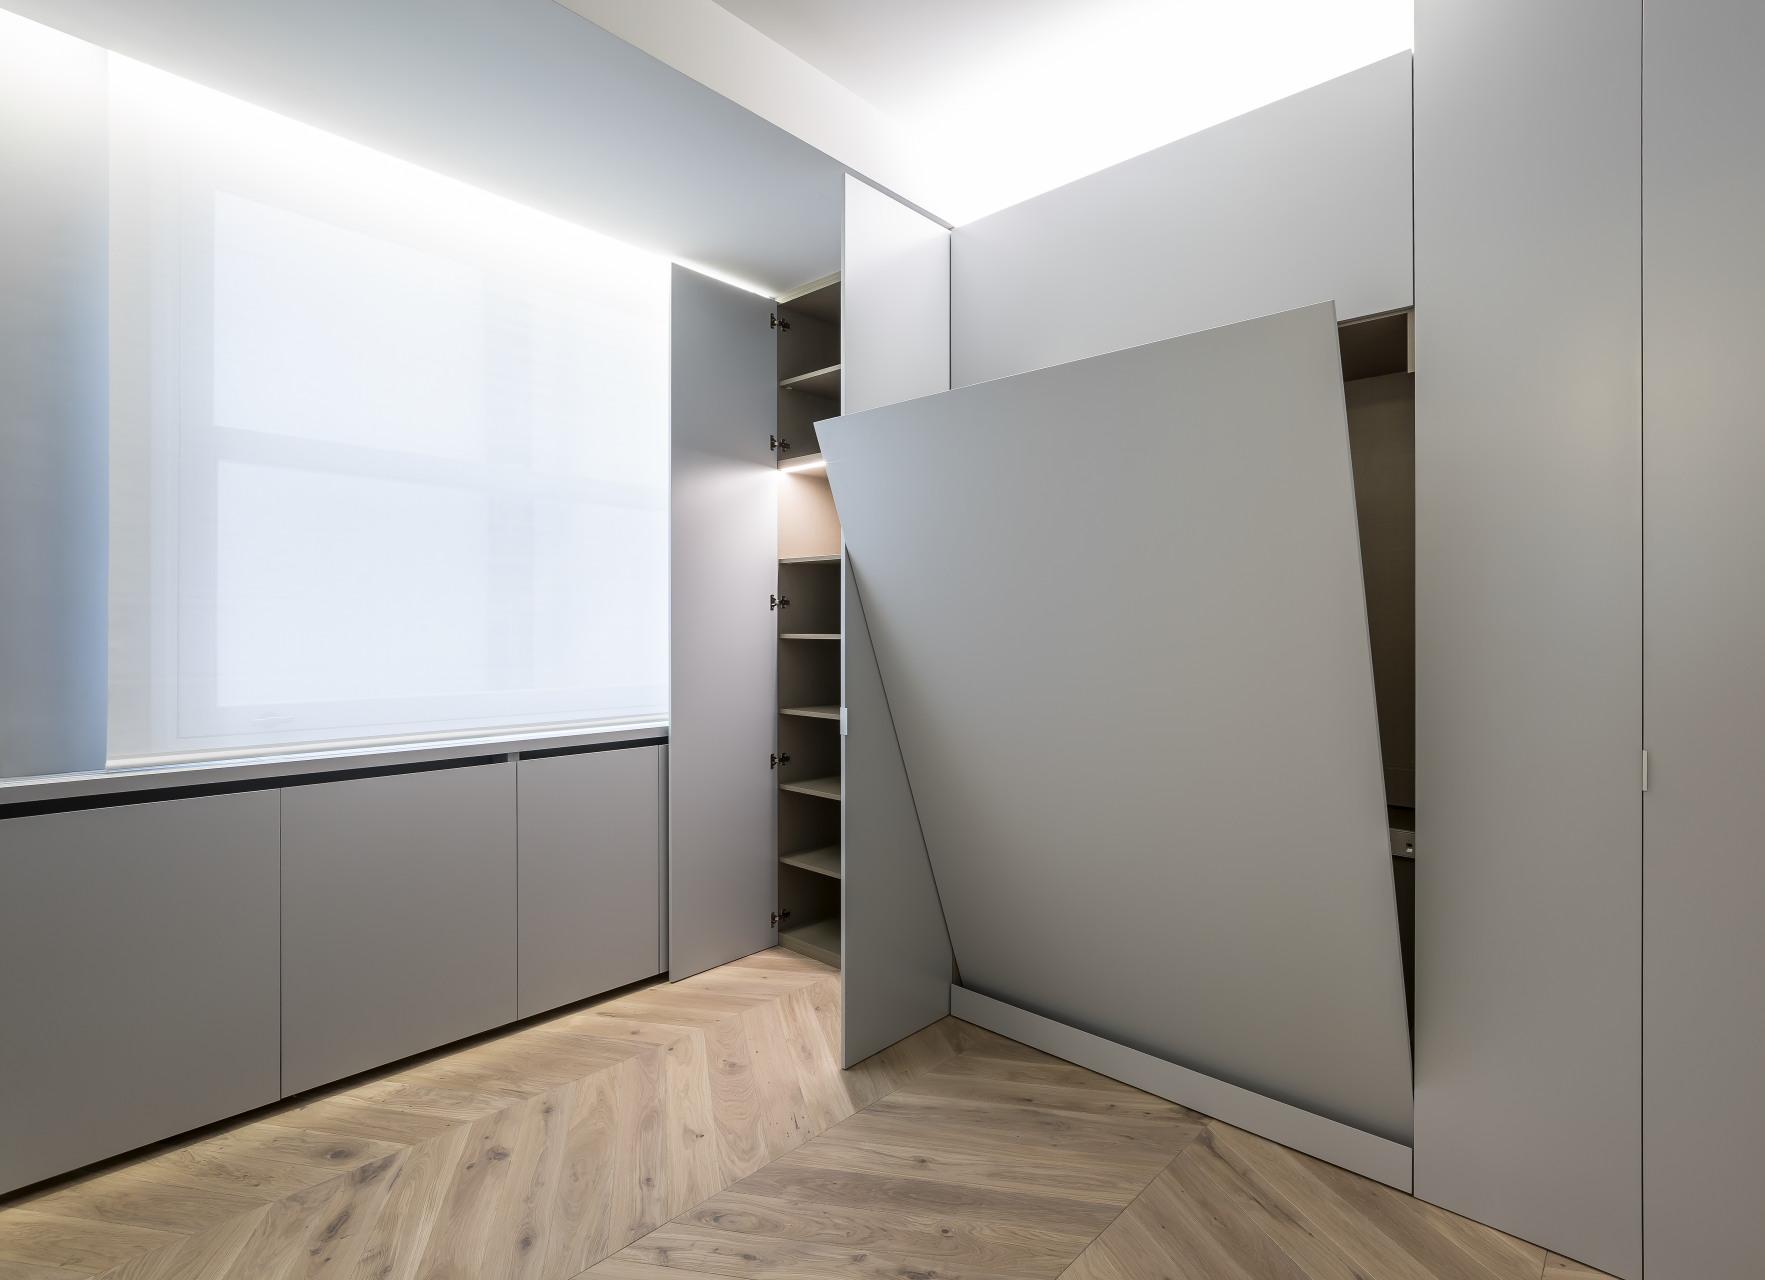 fotografia-arquitectura-valencia-german-cabo-gallardo-llopis-bfm-edificatoria-turia01 (6)